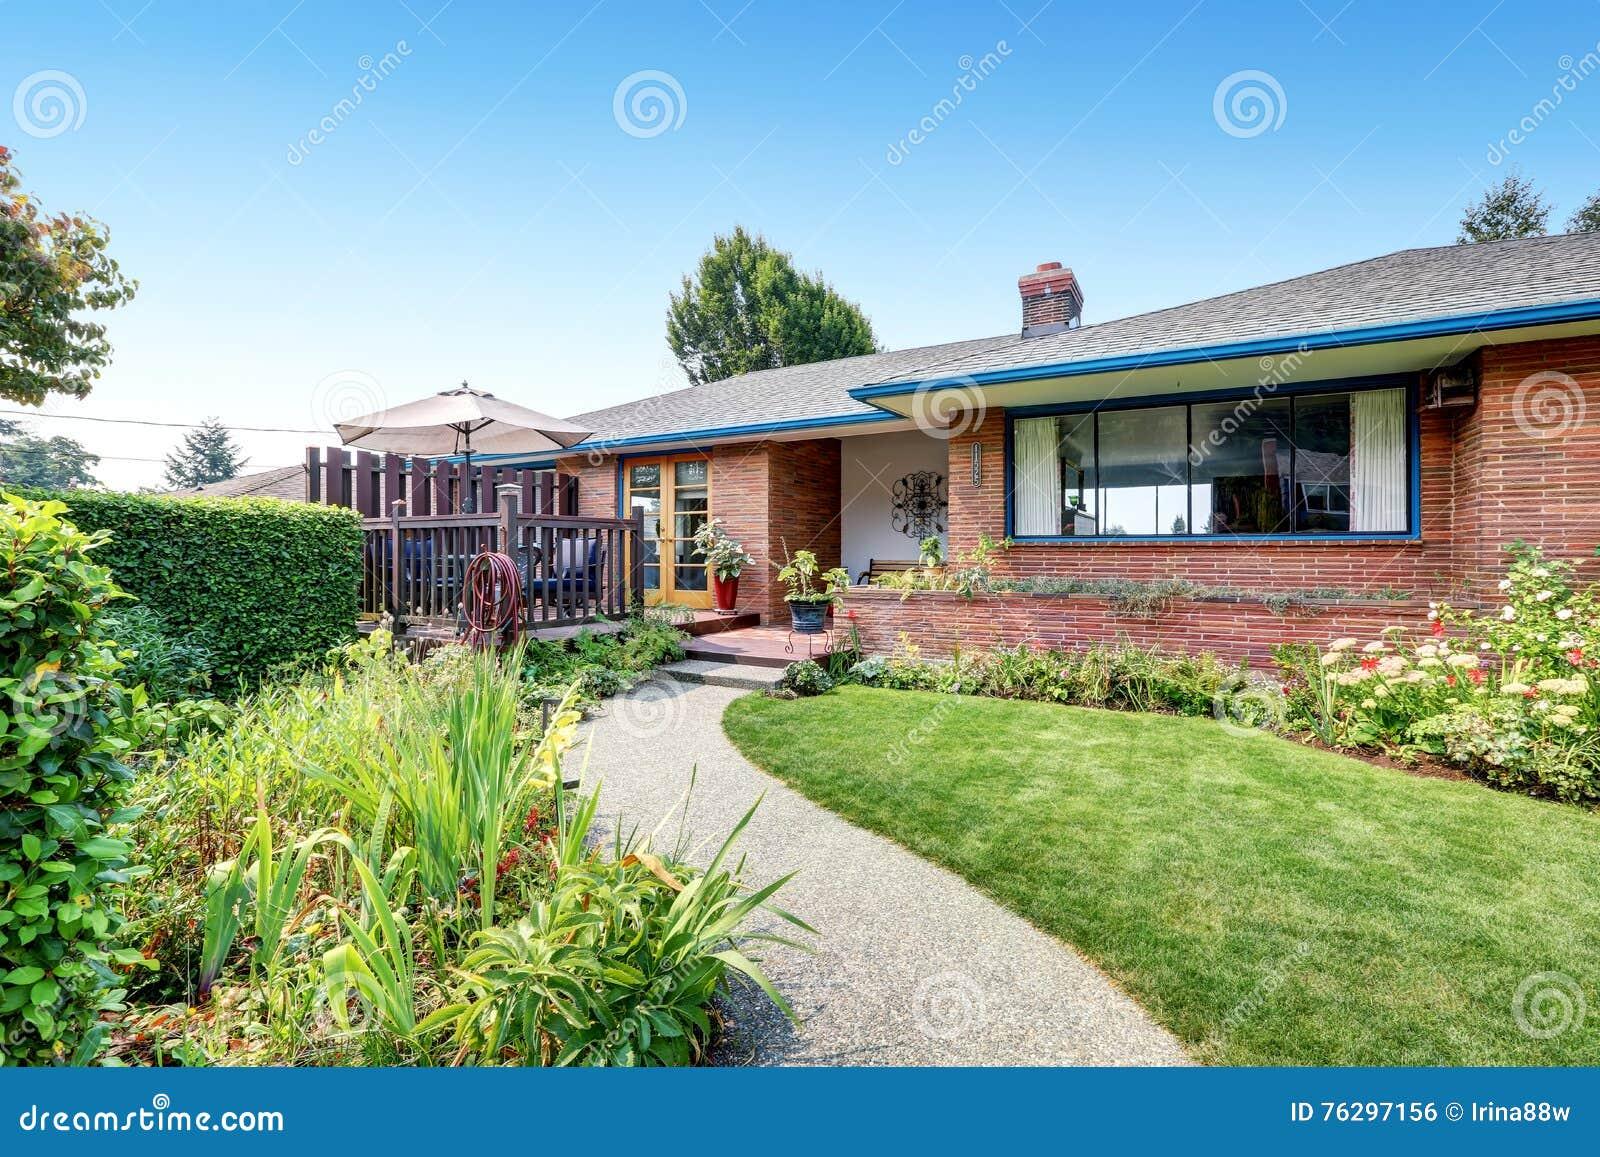 One Level Red Brick Rambler House Exterior Stock Photo